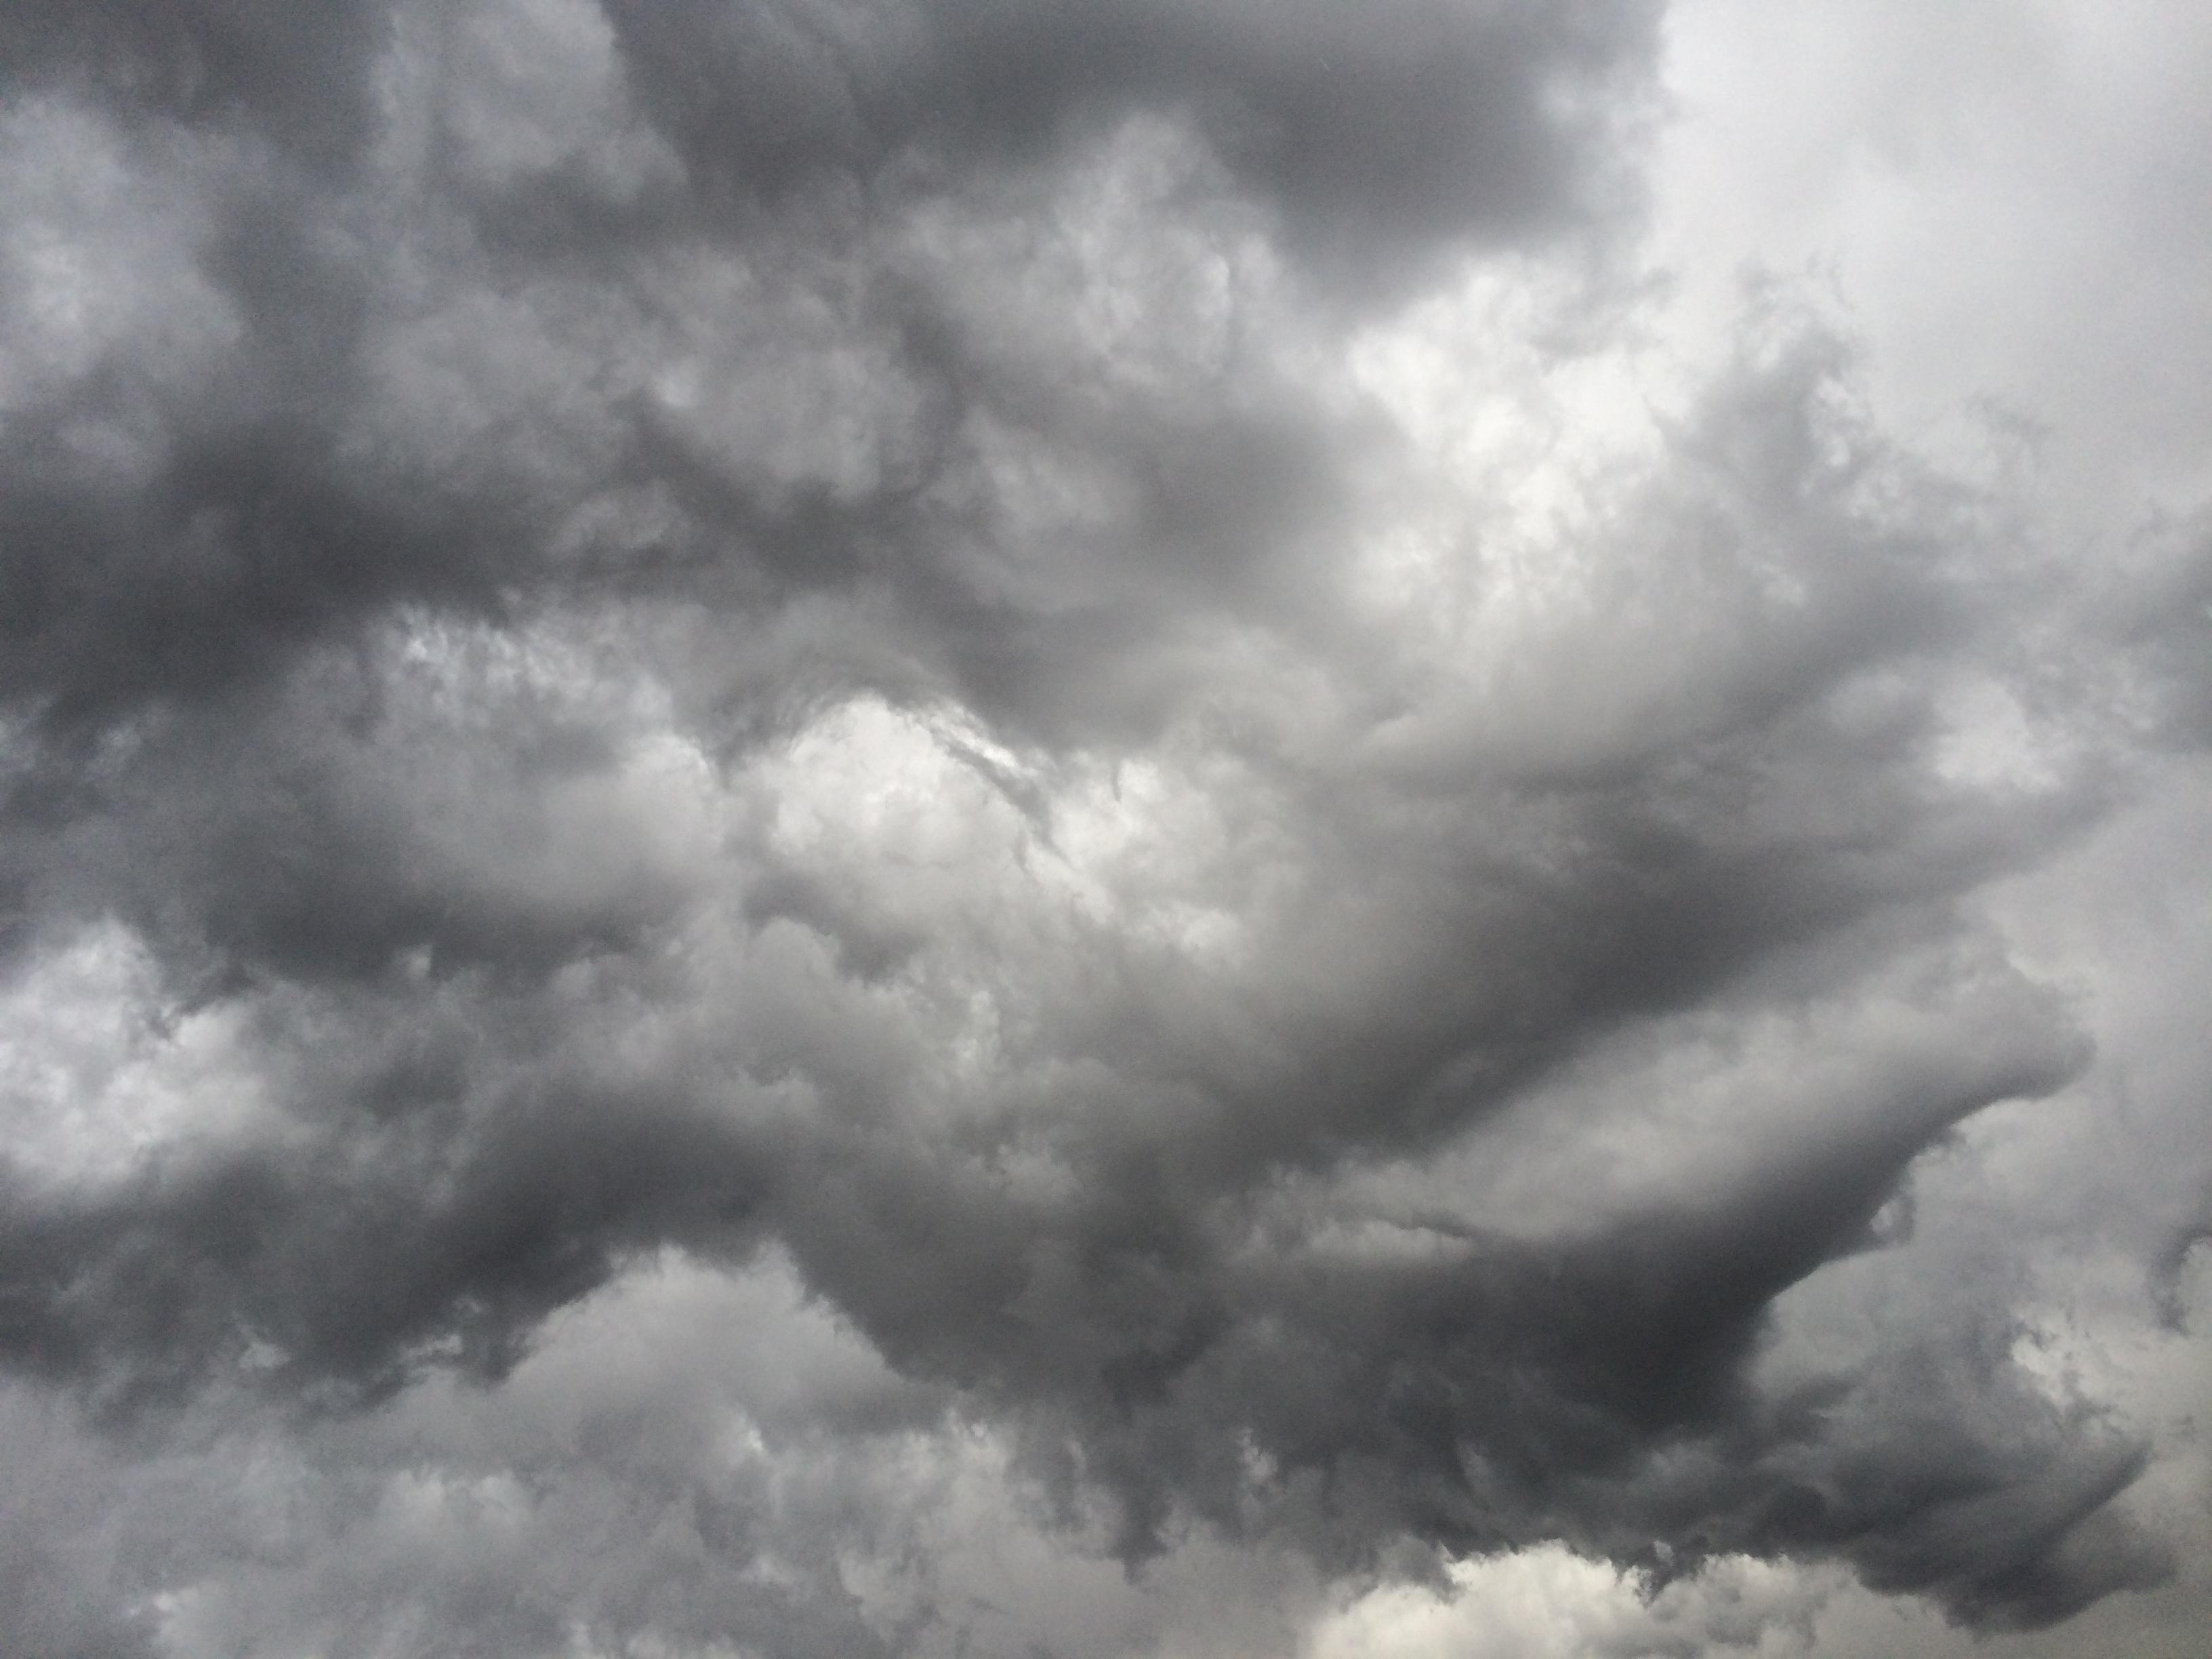 gambar hitam dan putih langit suasana siang hari